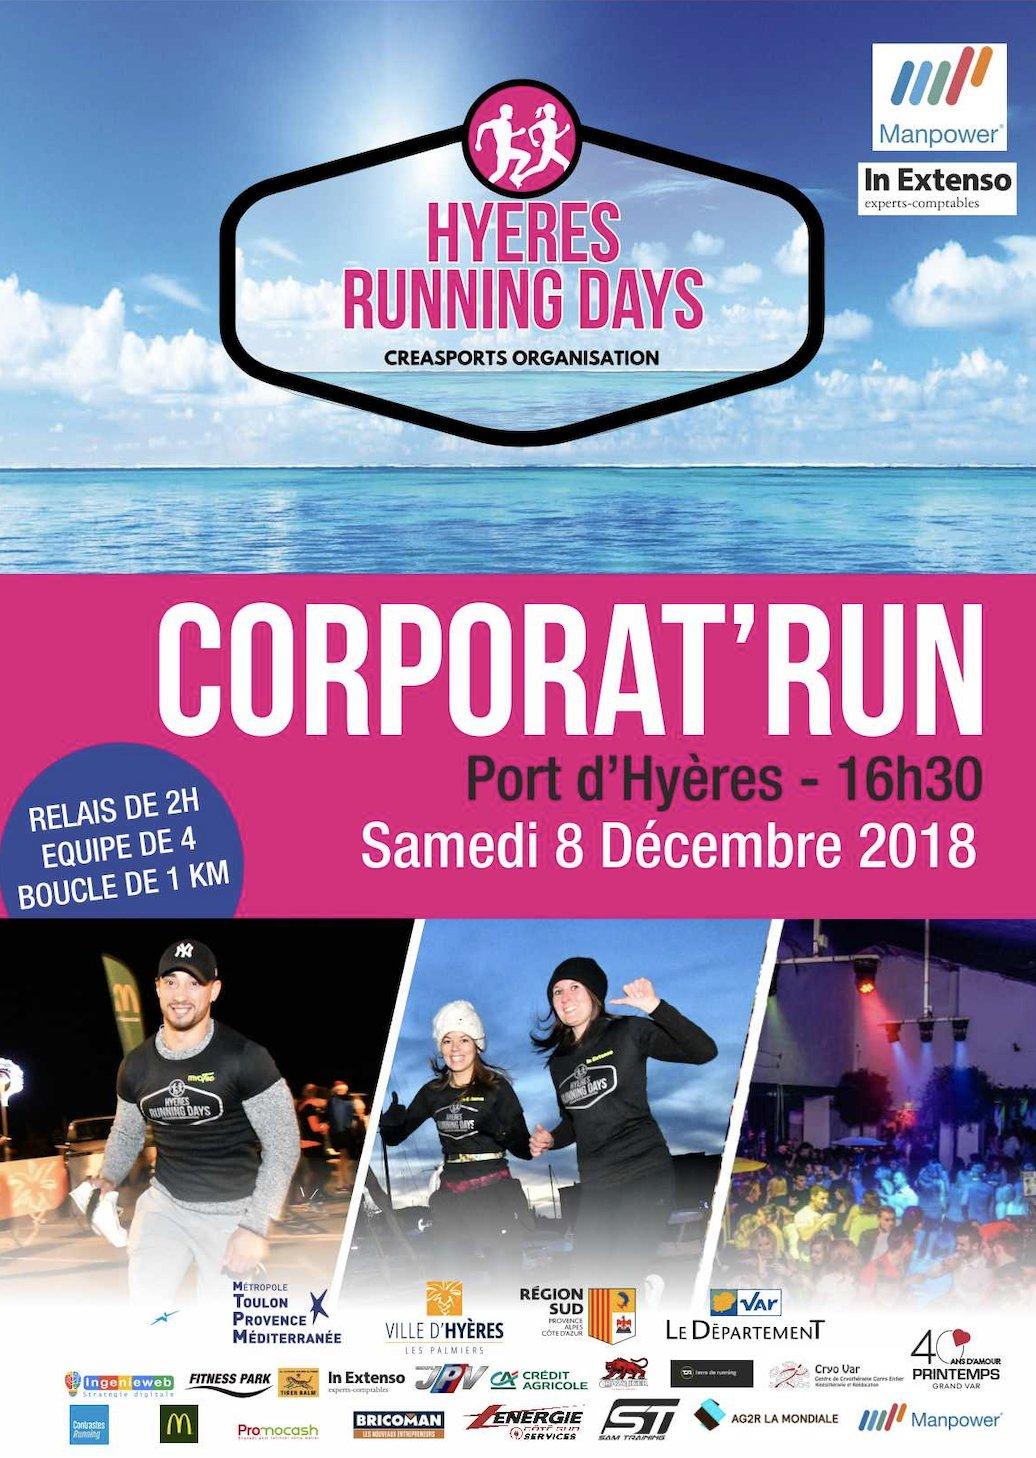 Corporat'Run HRD18 - 1/4